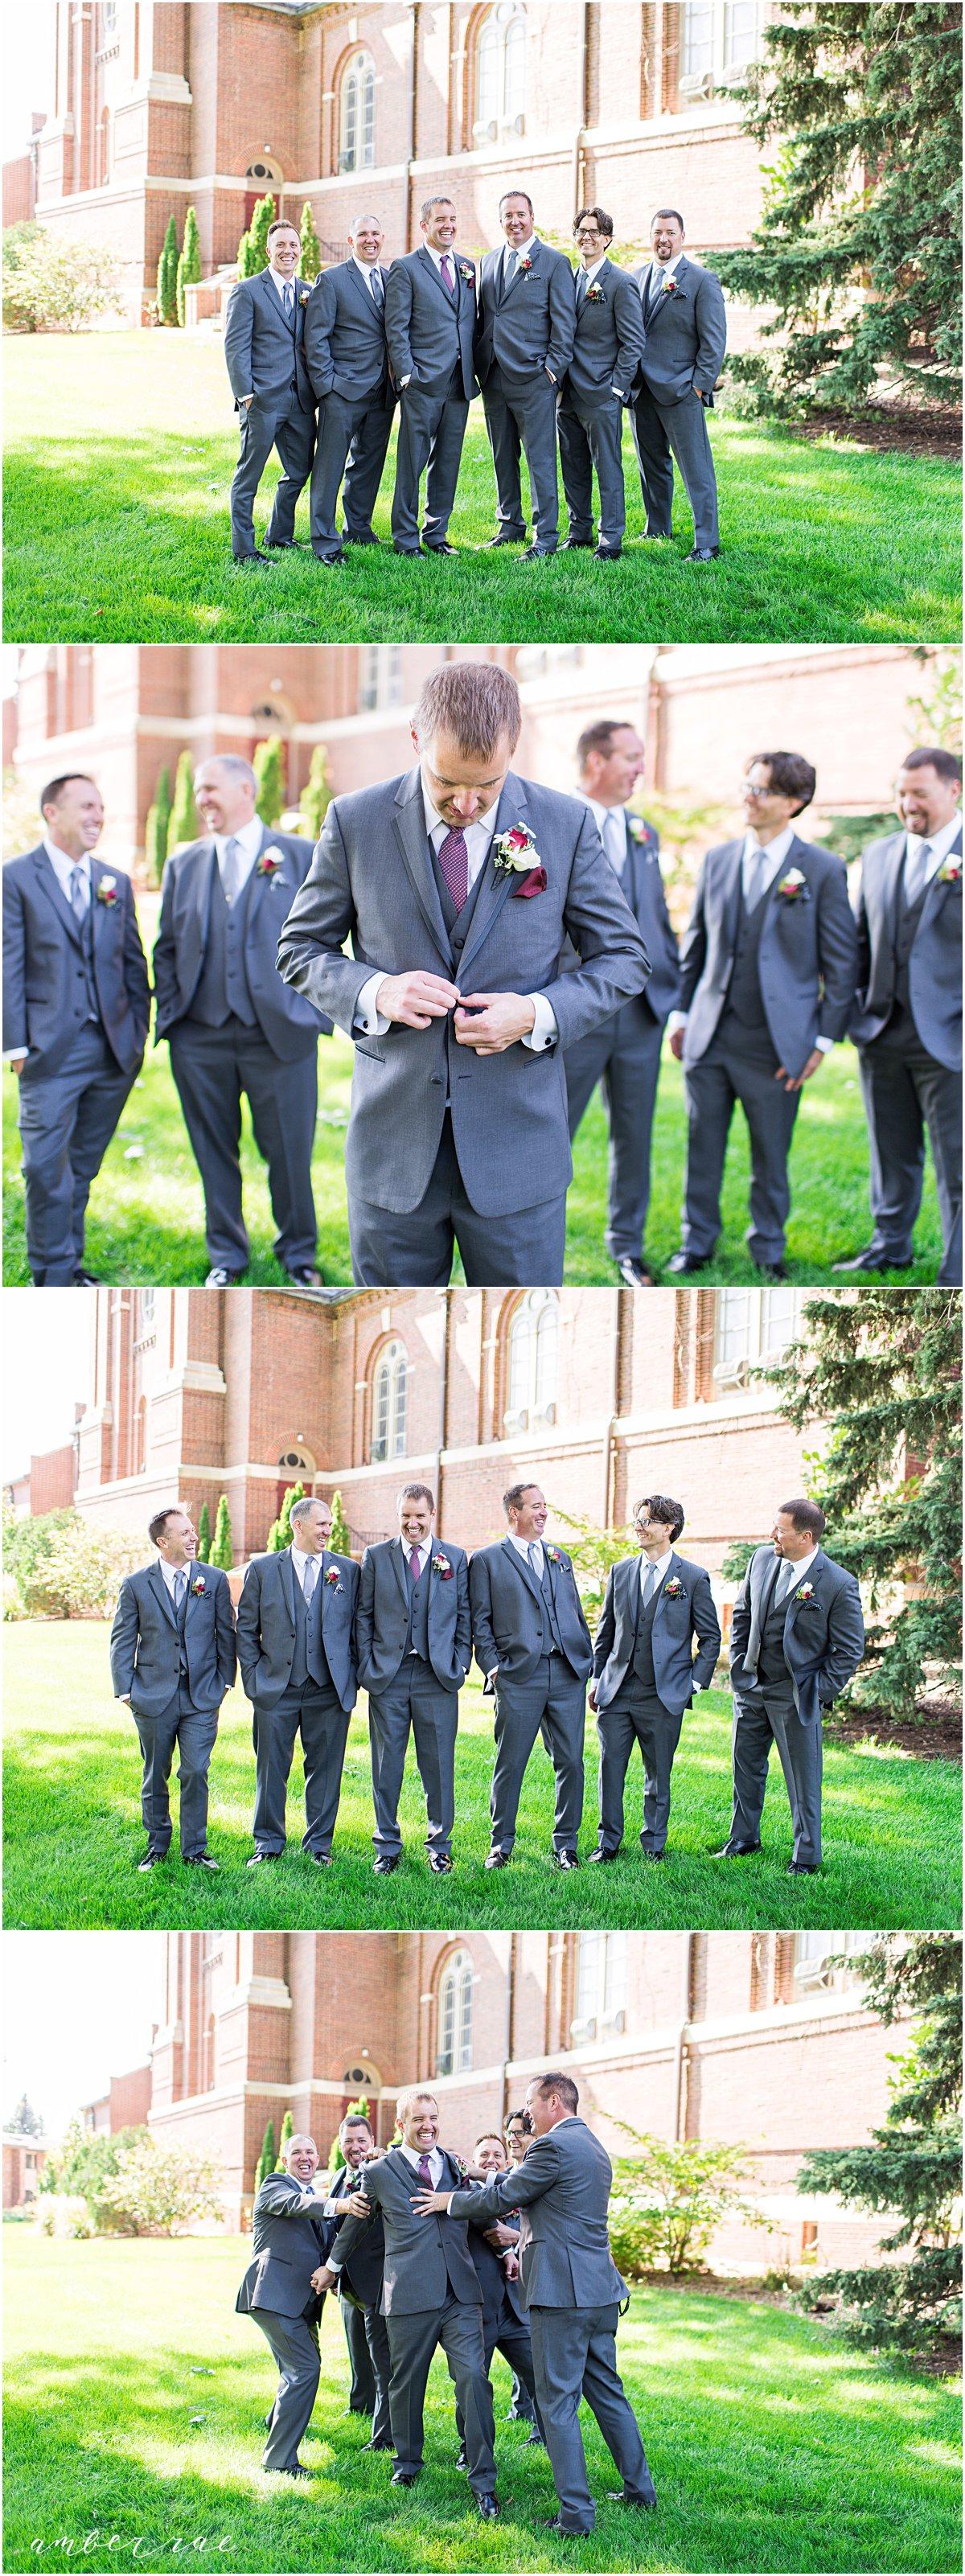 Gustafson Wedding 2018_0013.jpg